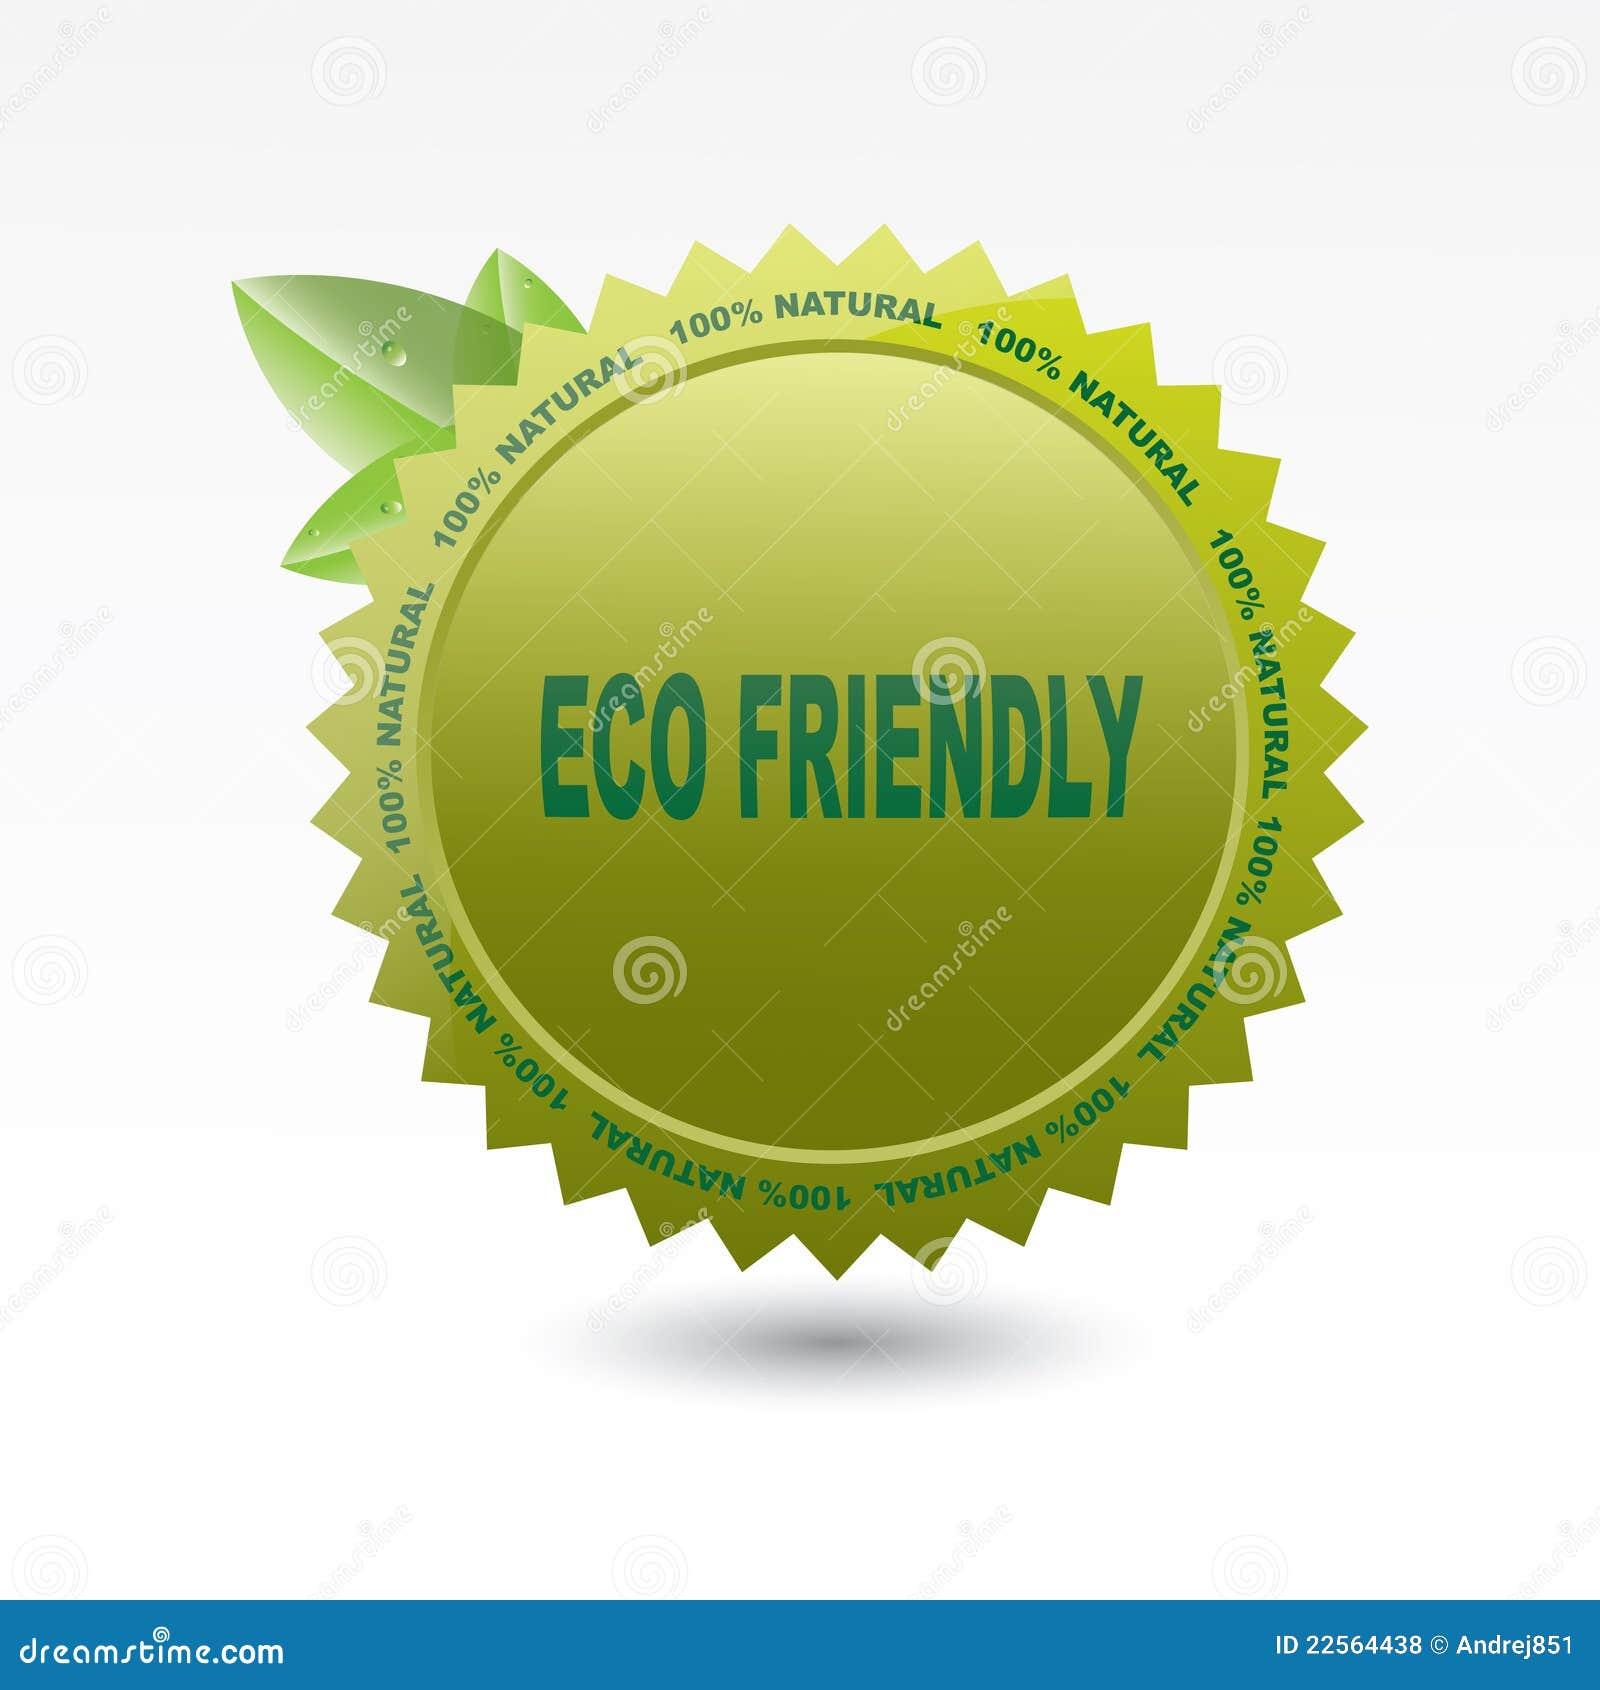 Eco Friendly Label Stock Illustration. Illustration Of